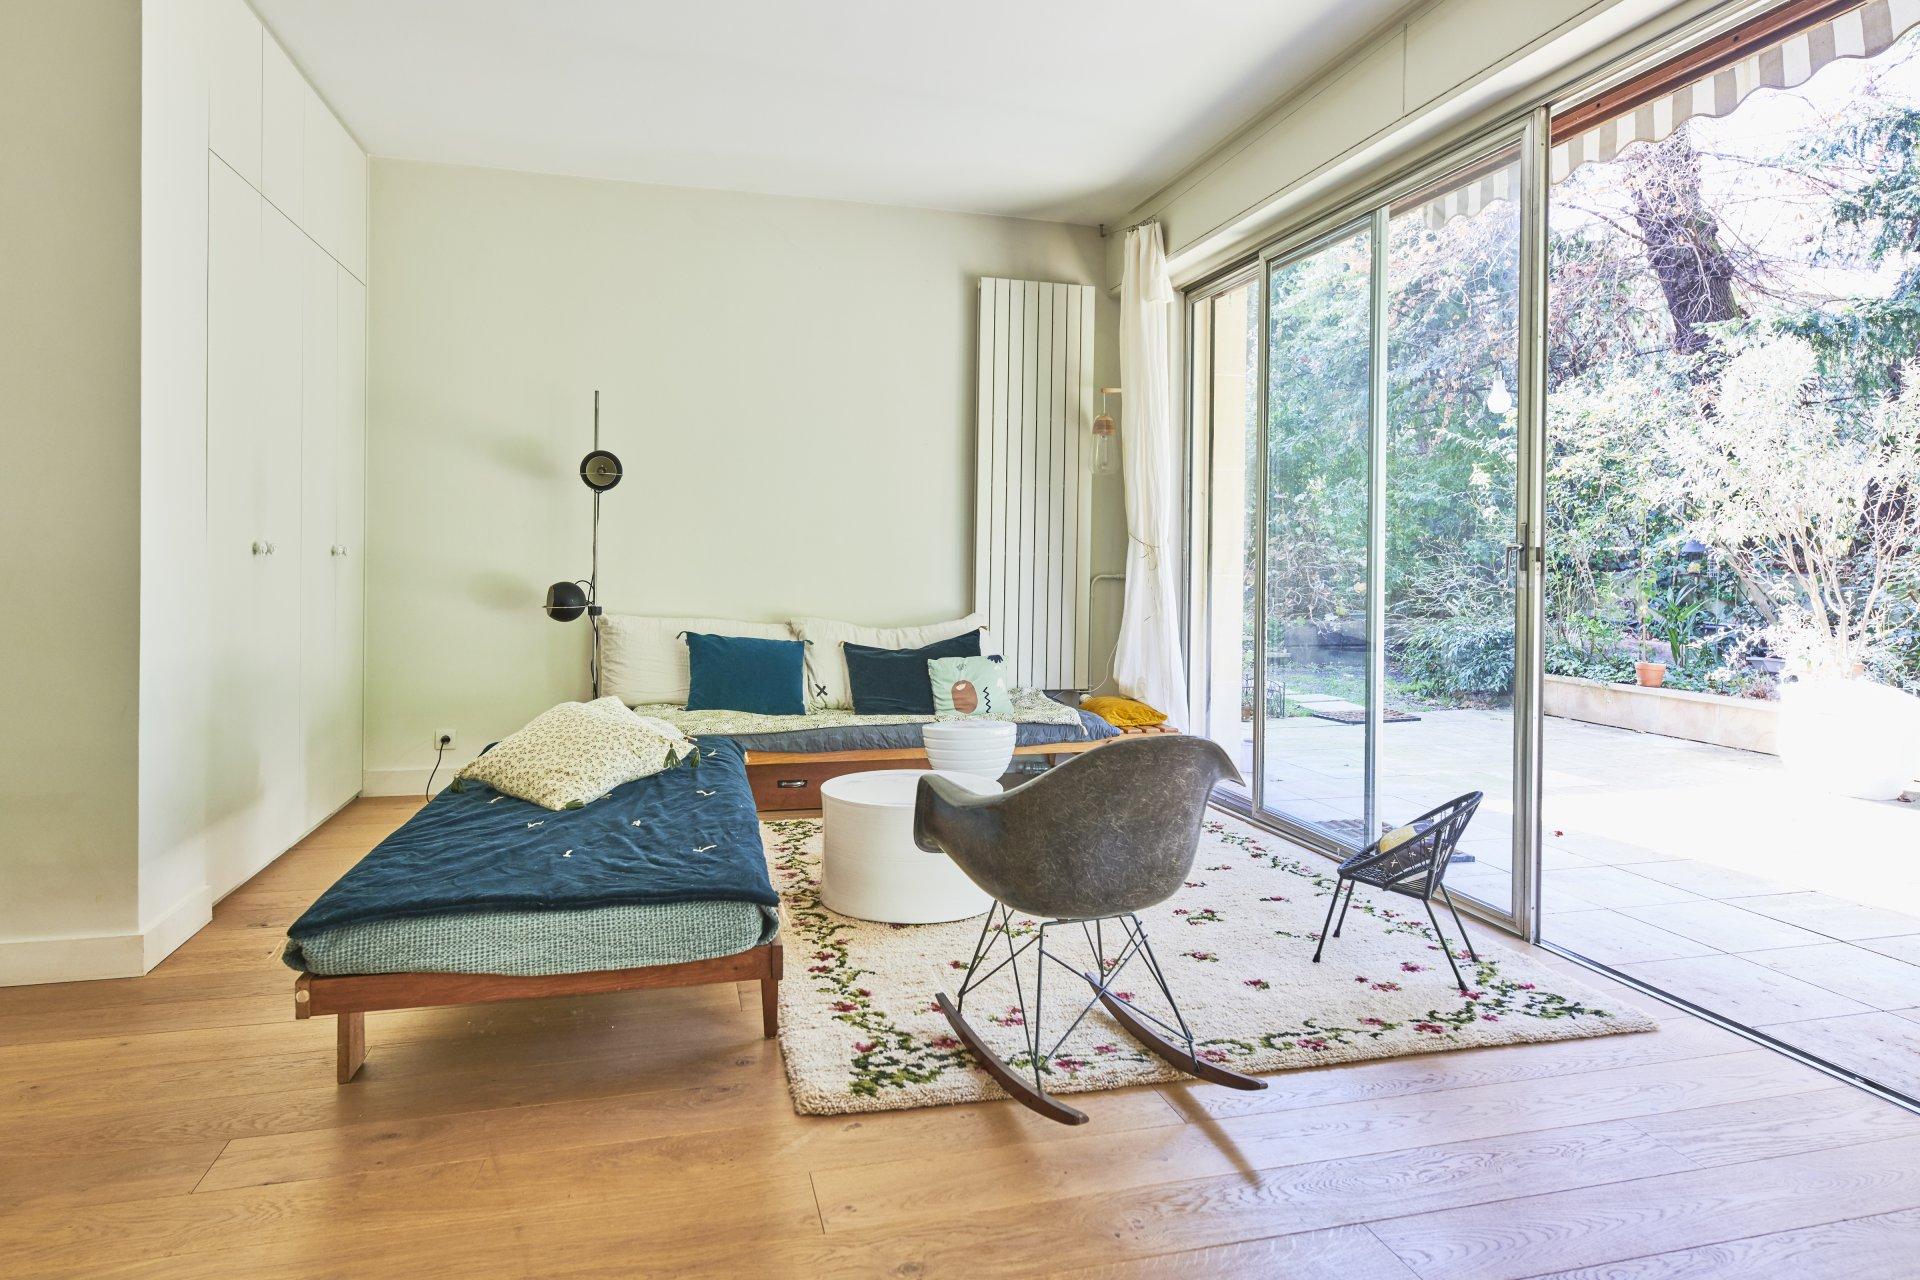 appartement-grand-jardin-a-vendr-grandes-baies-vitrees-terrasse-cave-parking